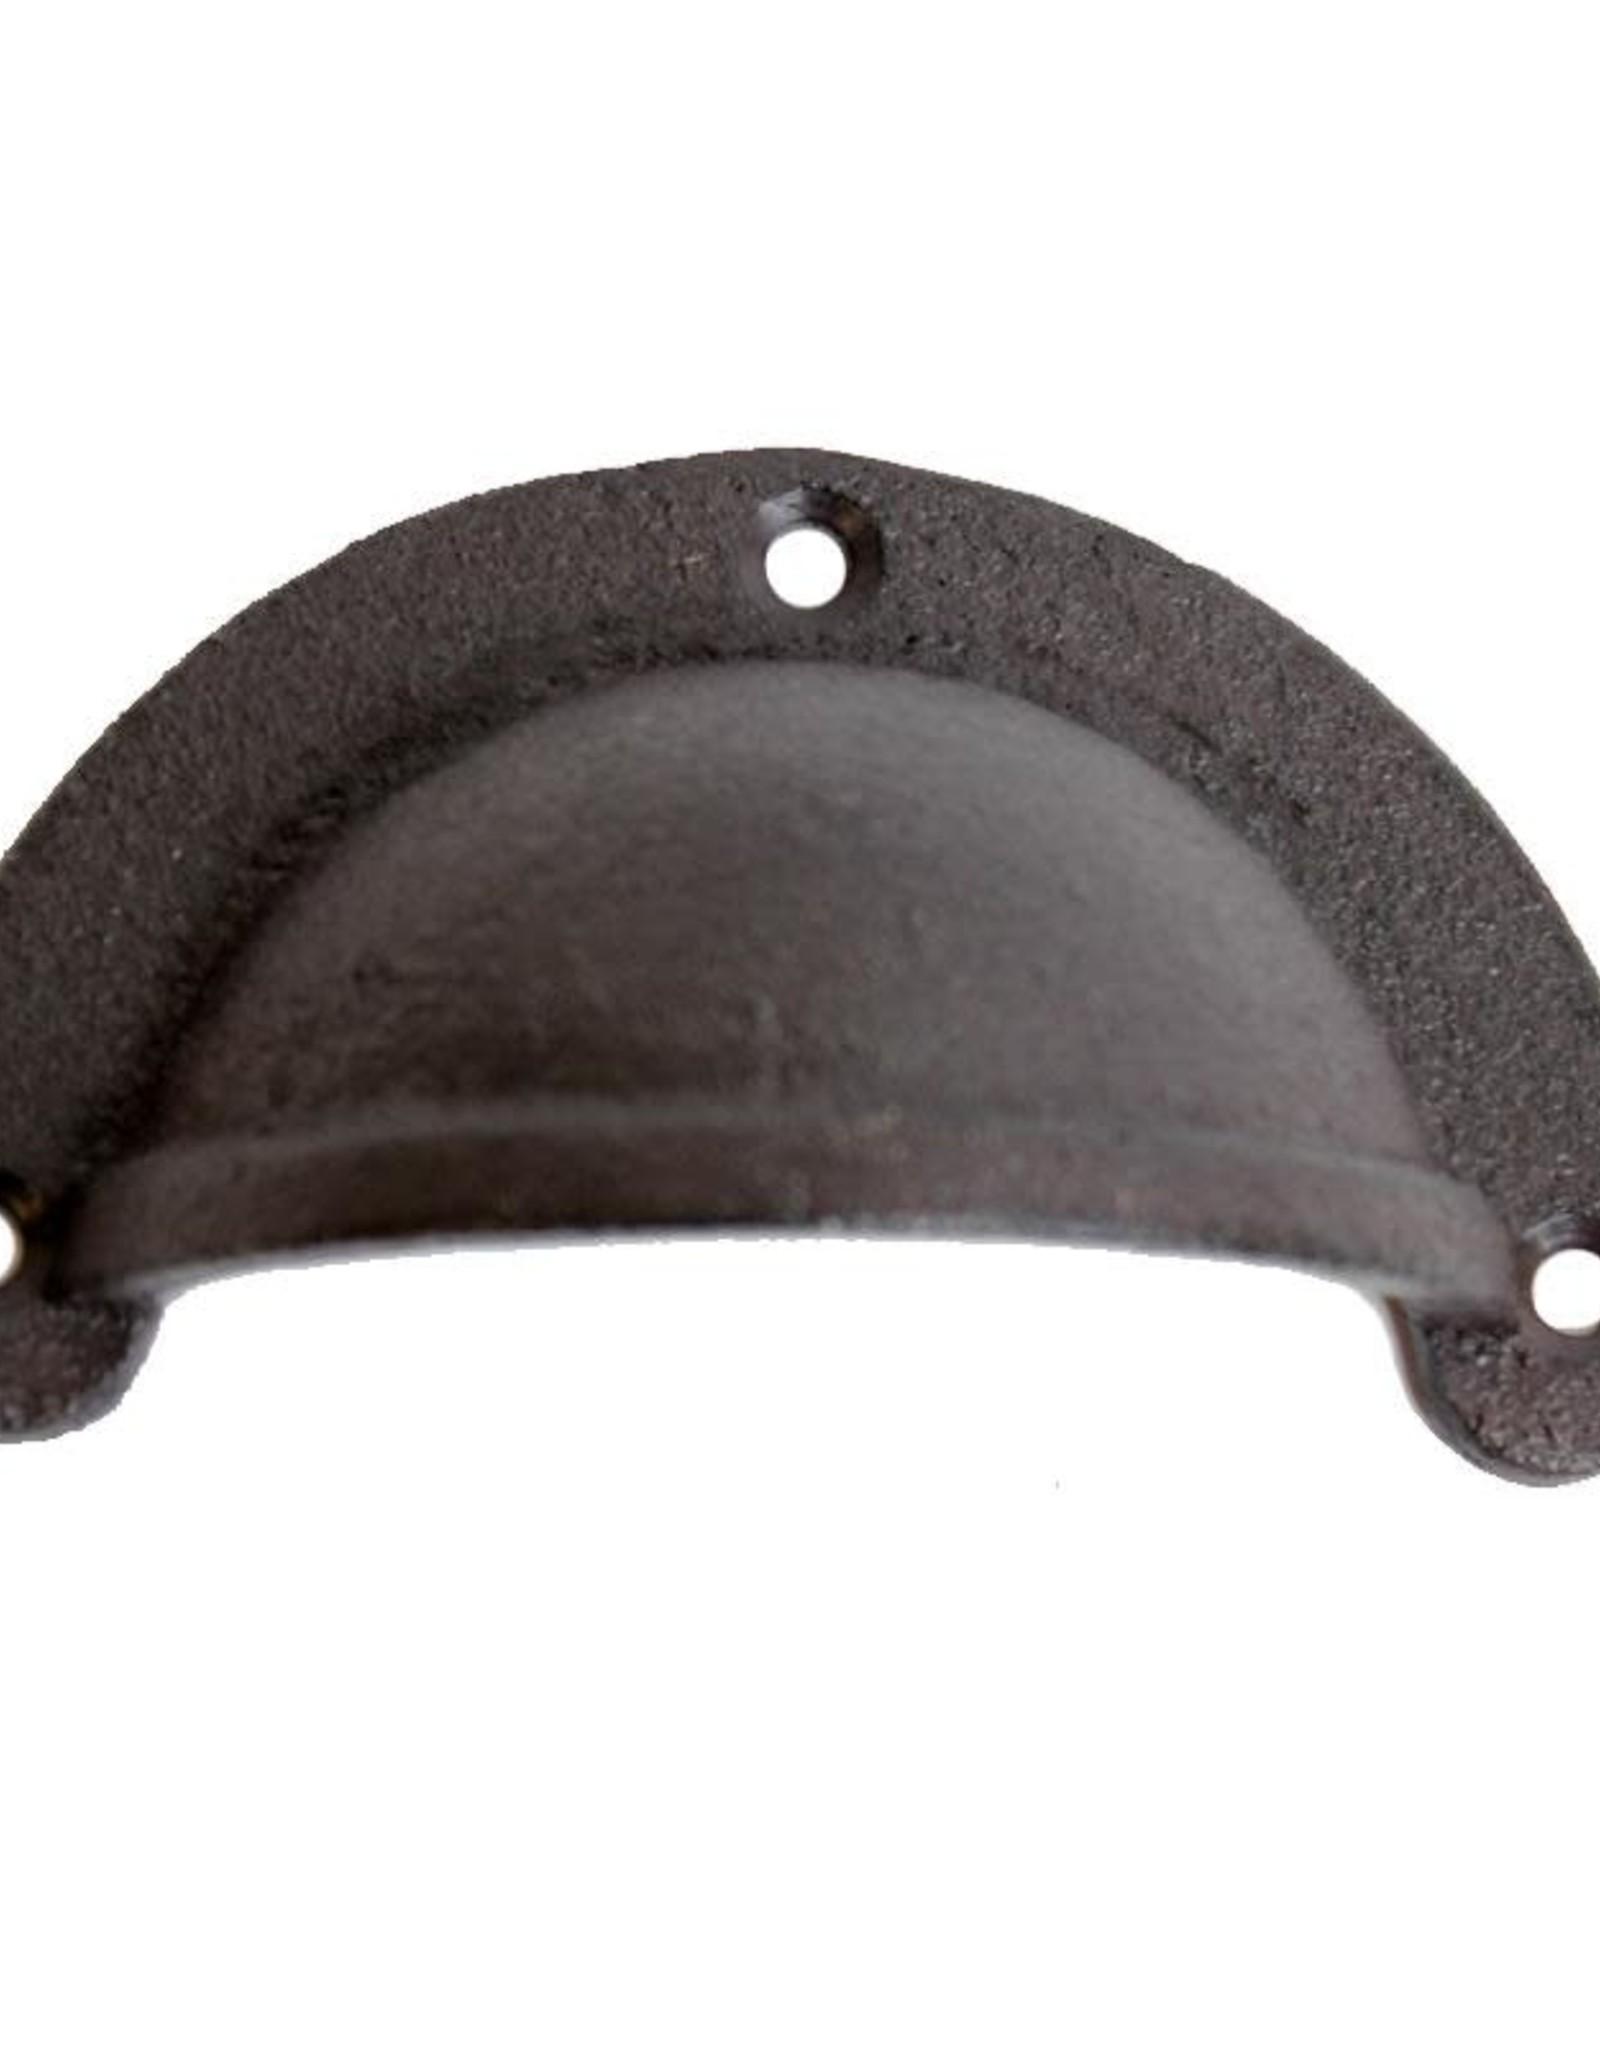 Cast Iron Drawer Pull